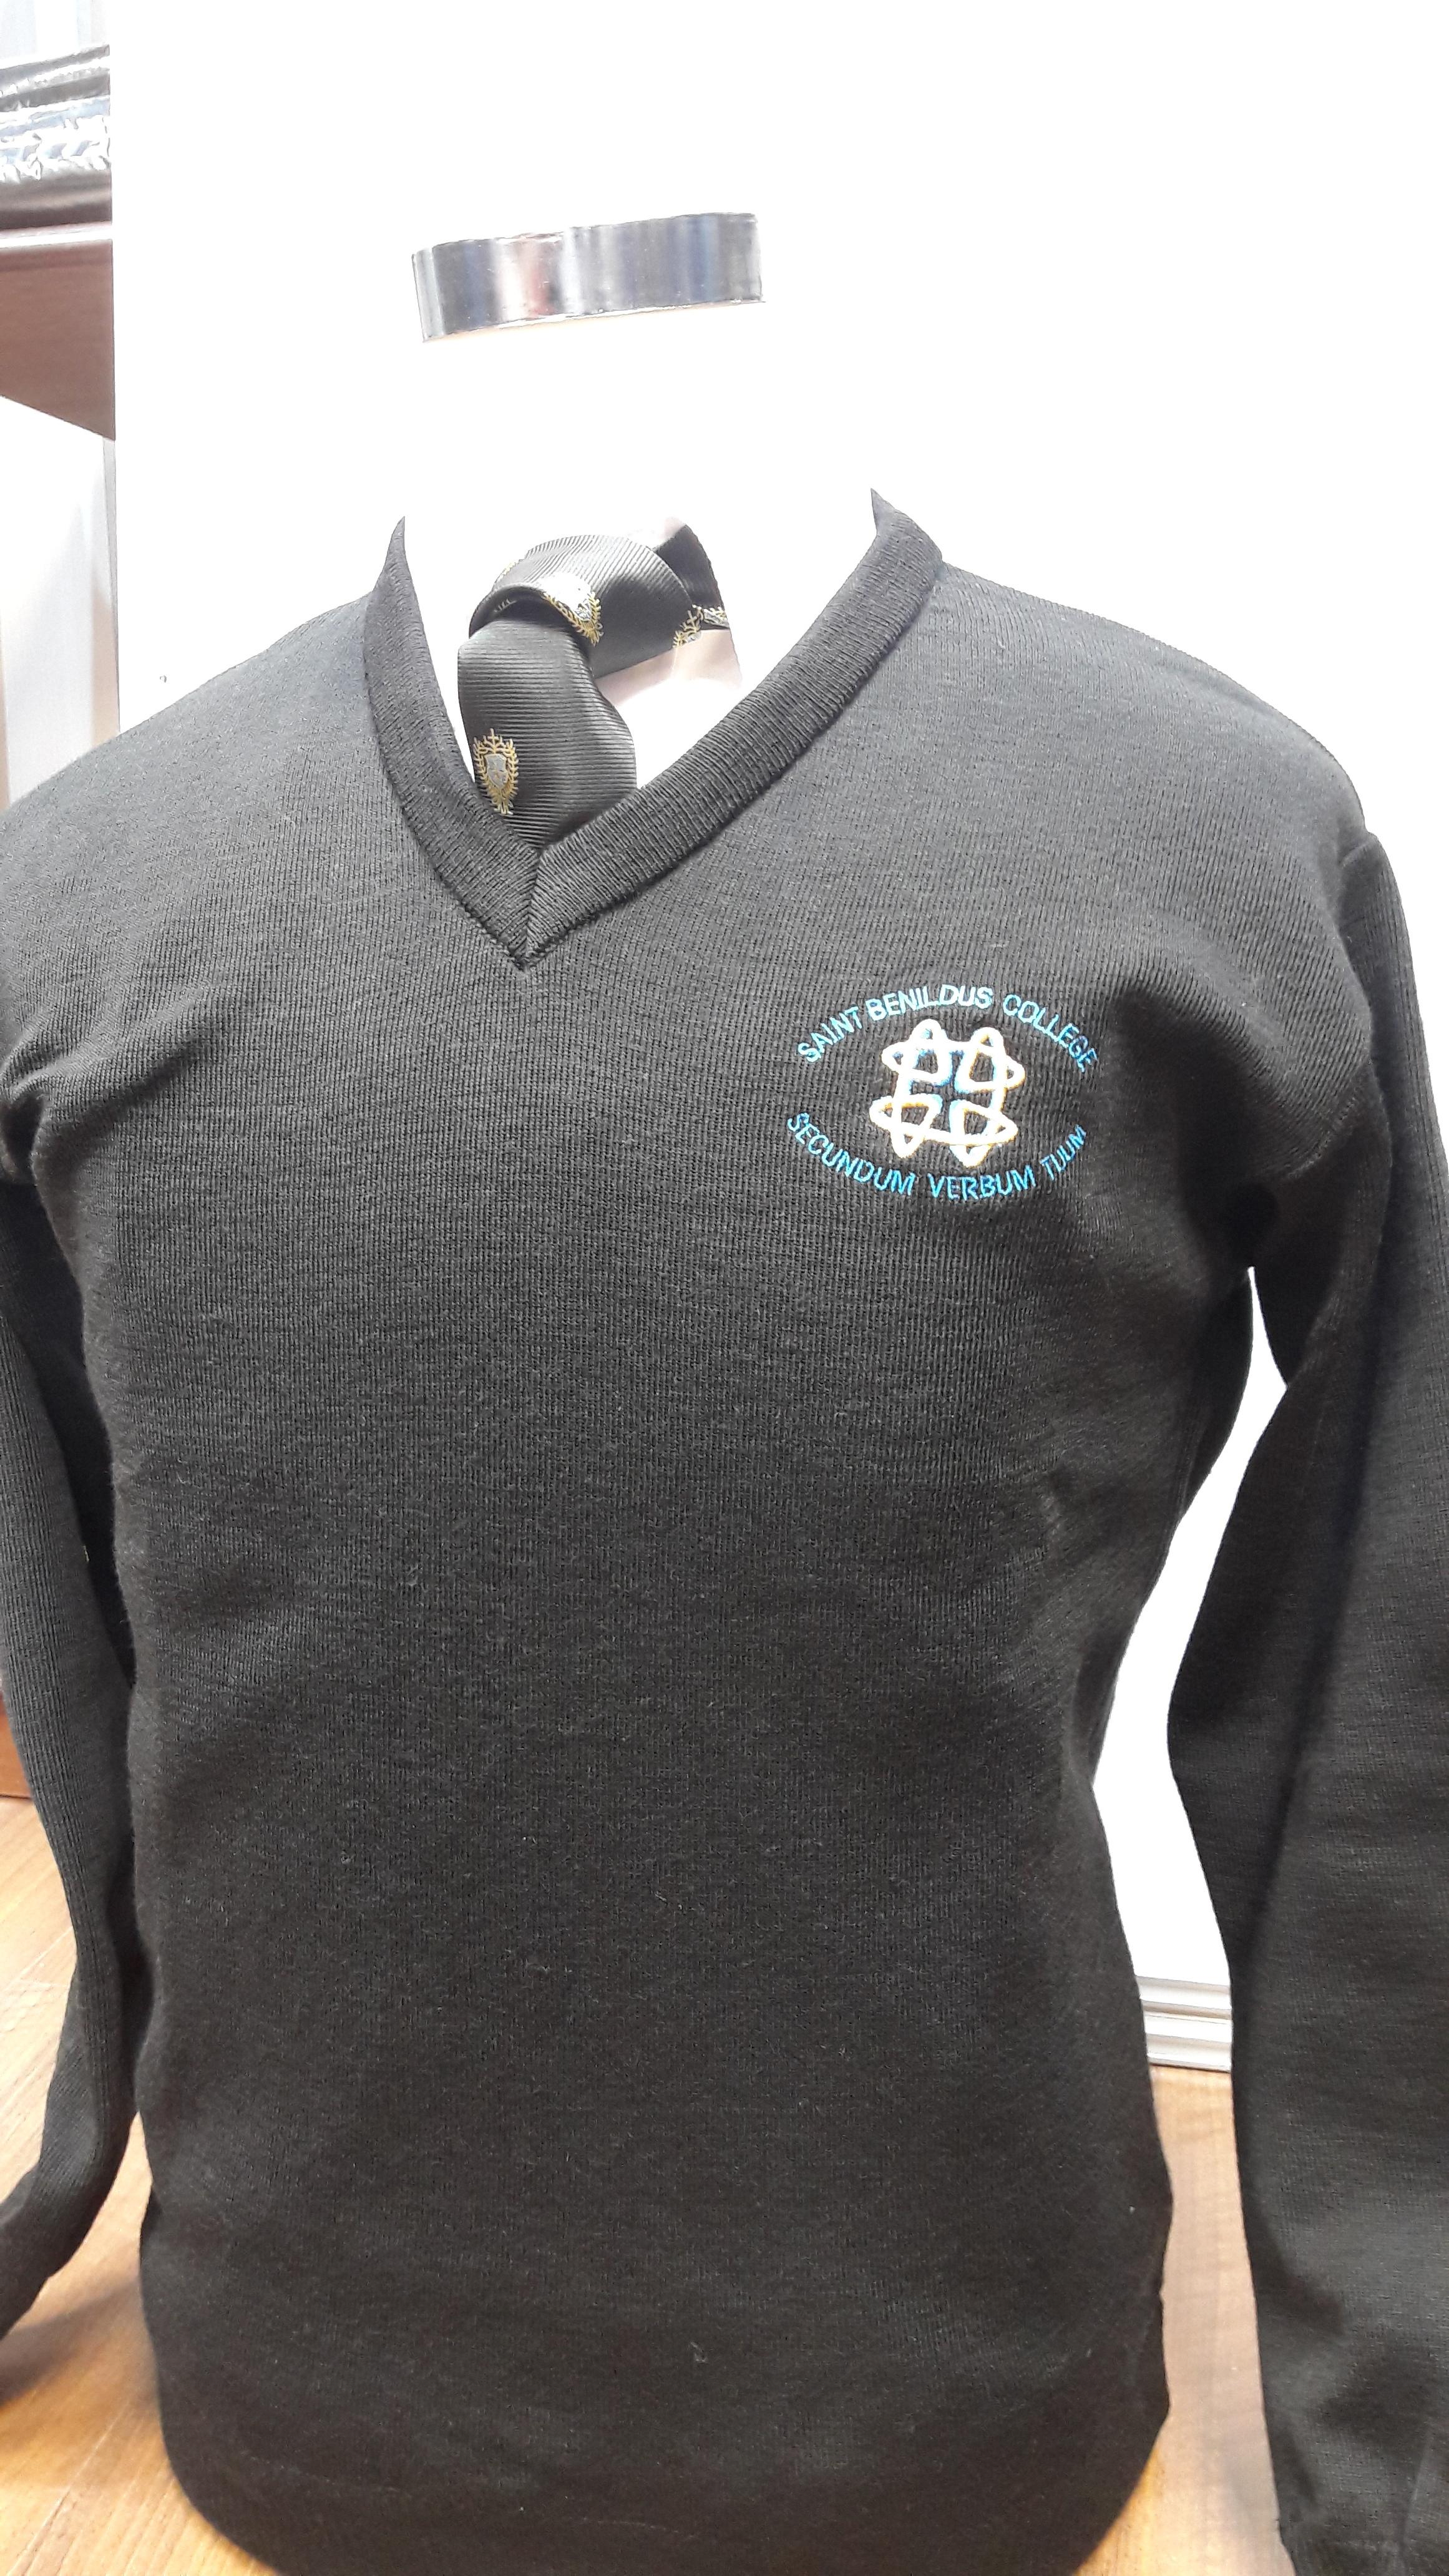 School uniform 2.jpg